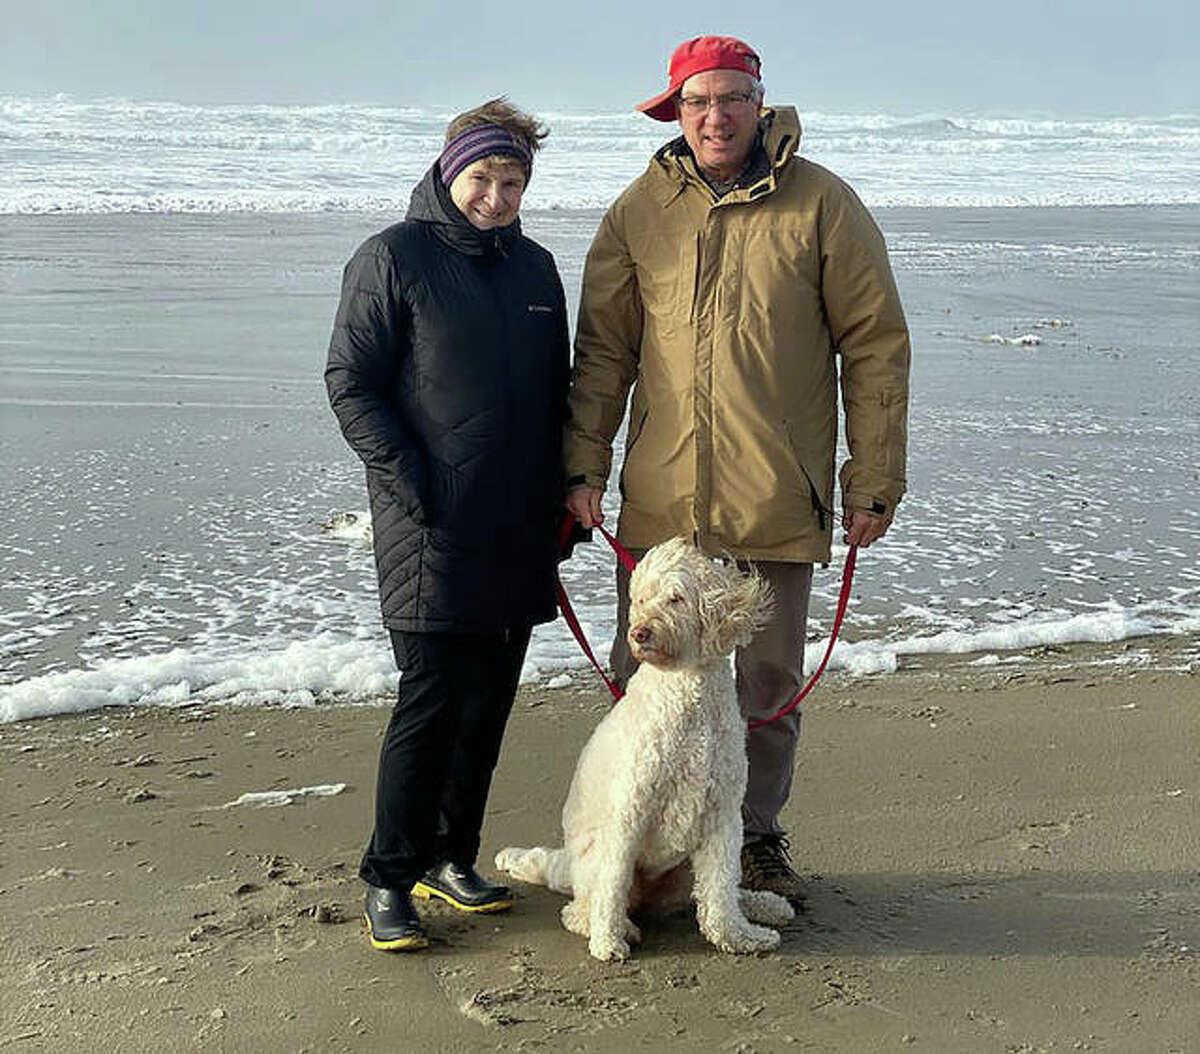 Edwardsville graduate Jim Krejci, his wife, Betty, and their dog, Haley, at Oregon Beach on Dec. 29, 2020.